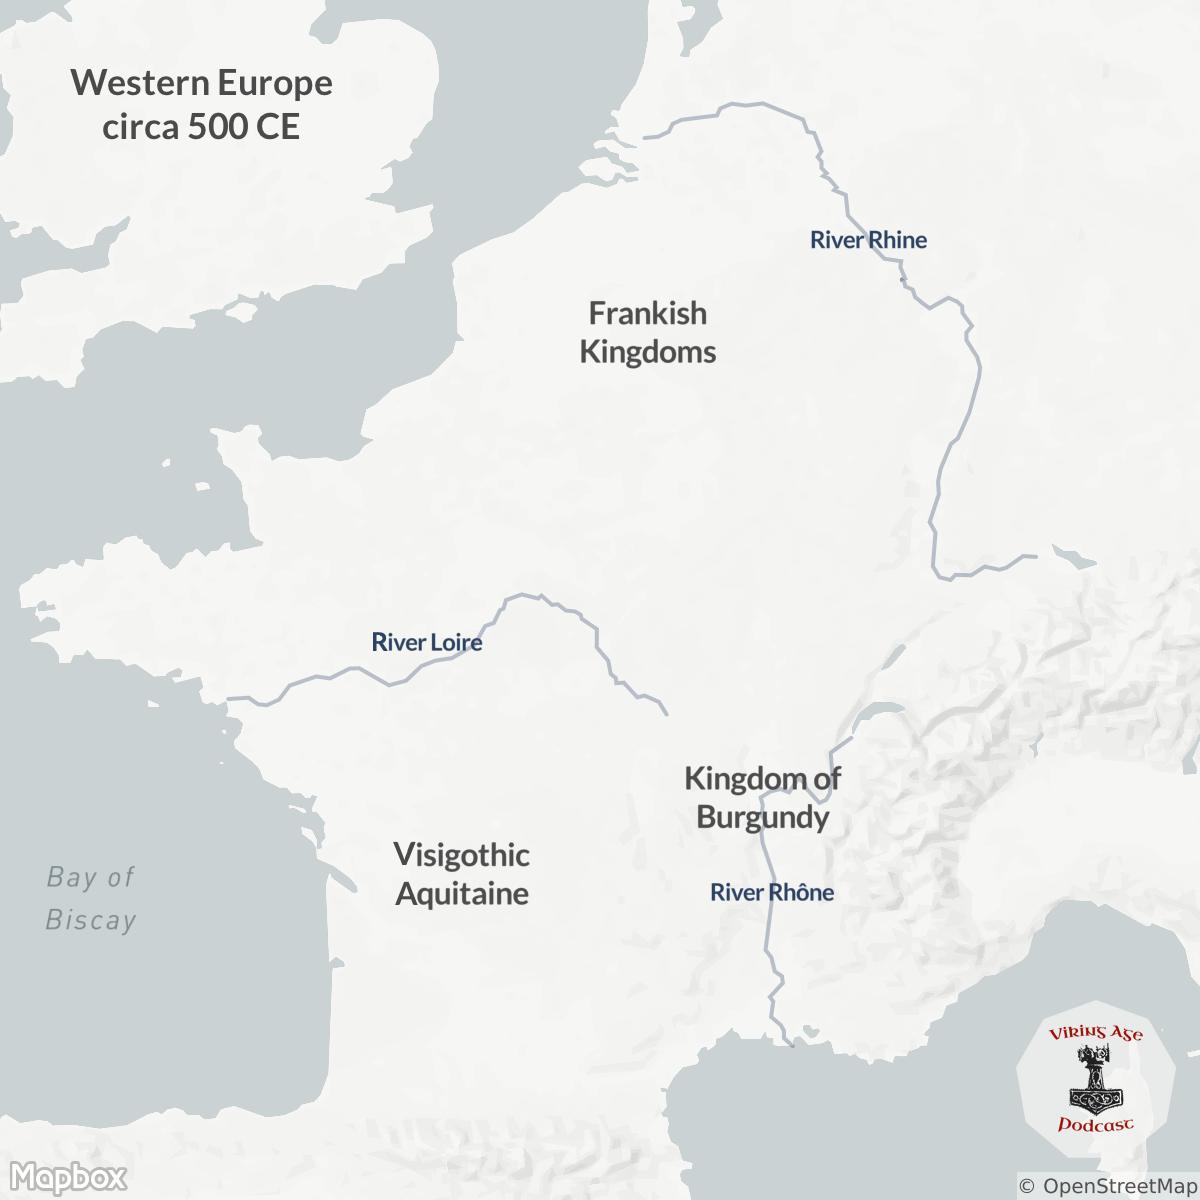 Map of Western Europe Circa 500 CE